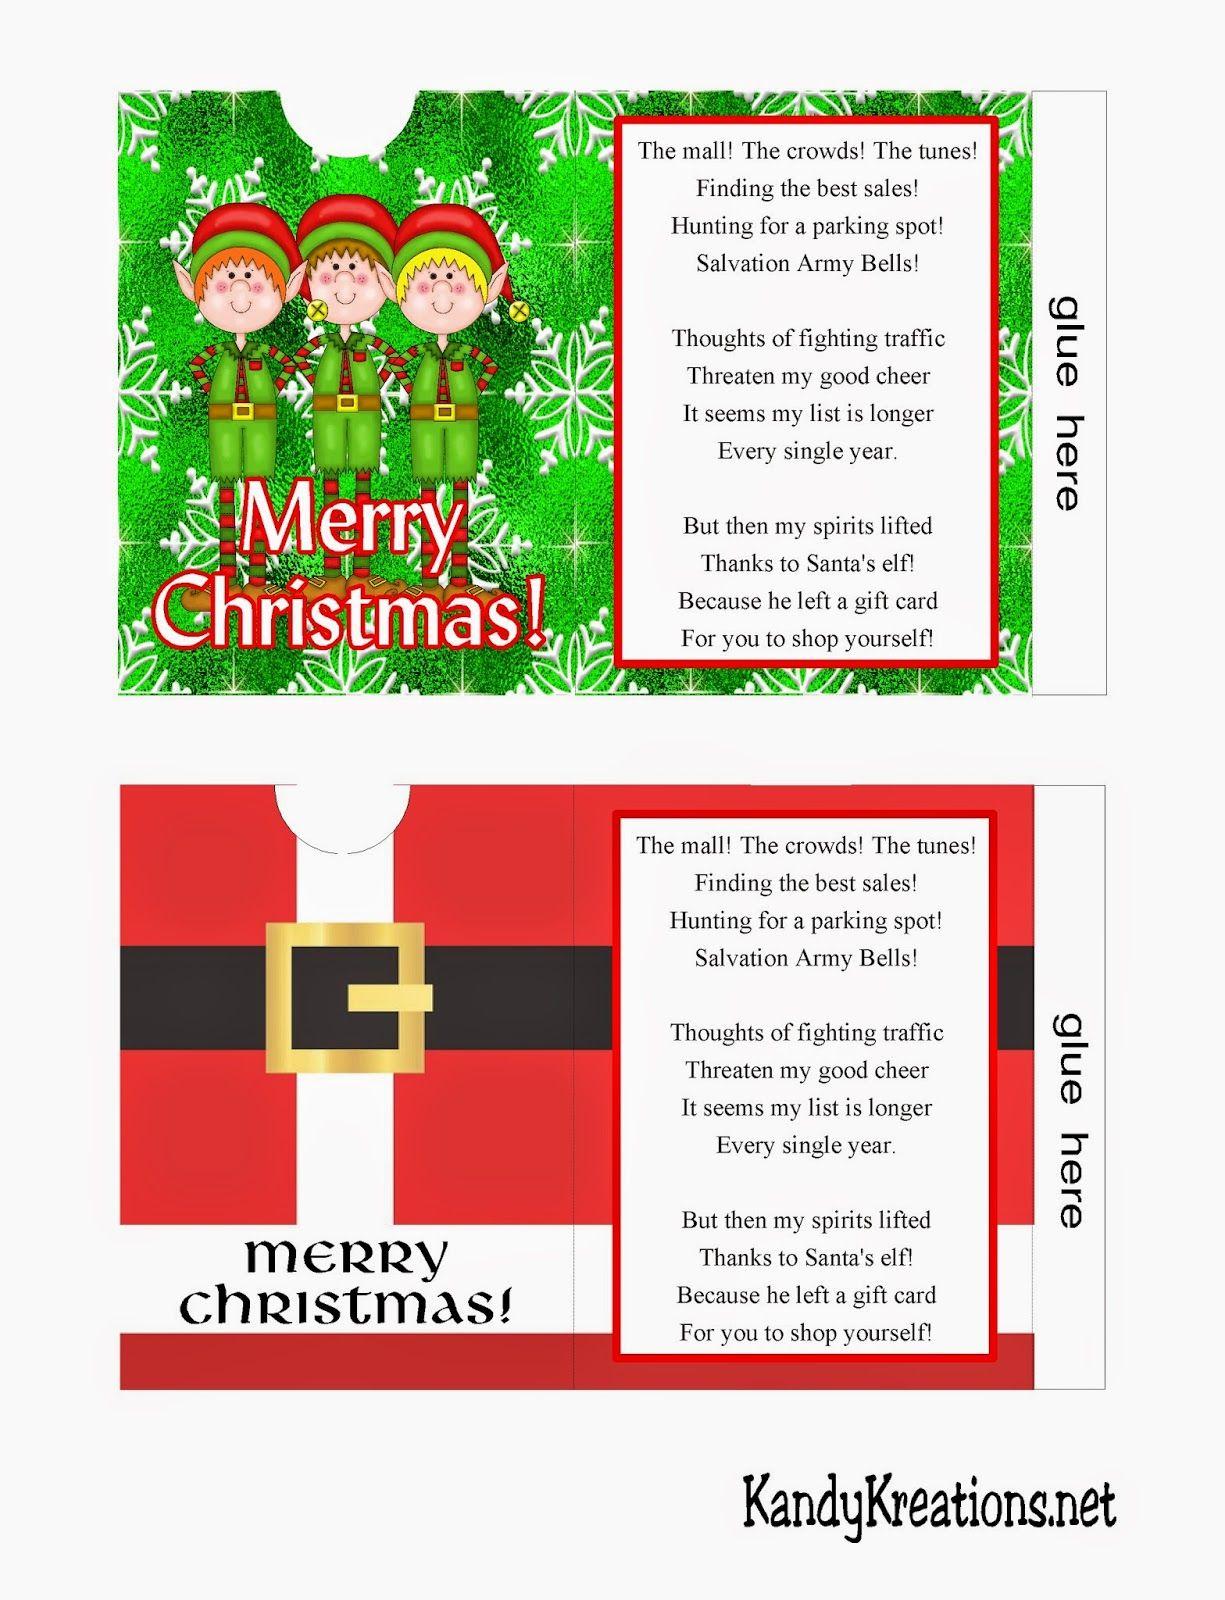 Christmas Gift Card Envelope Free Printables Christmas Gift Card Gift Card Envelope Card Envelopes